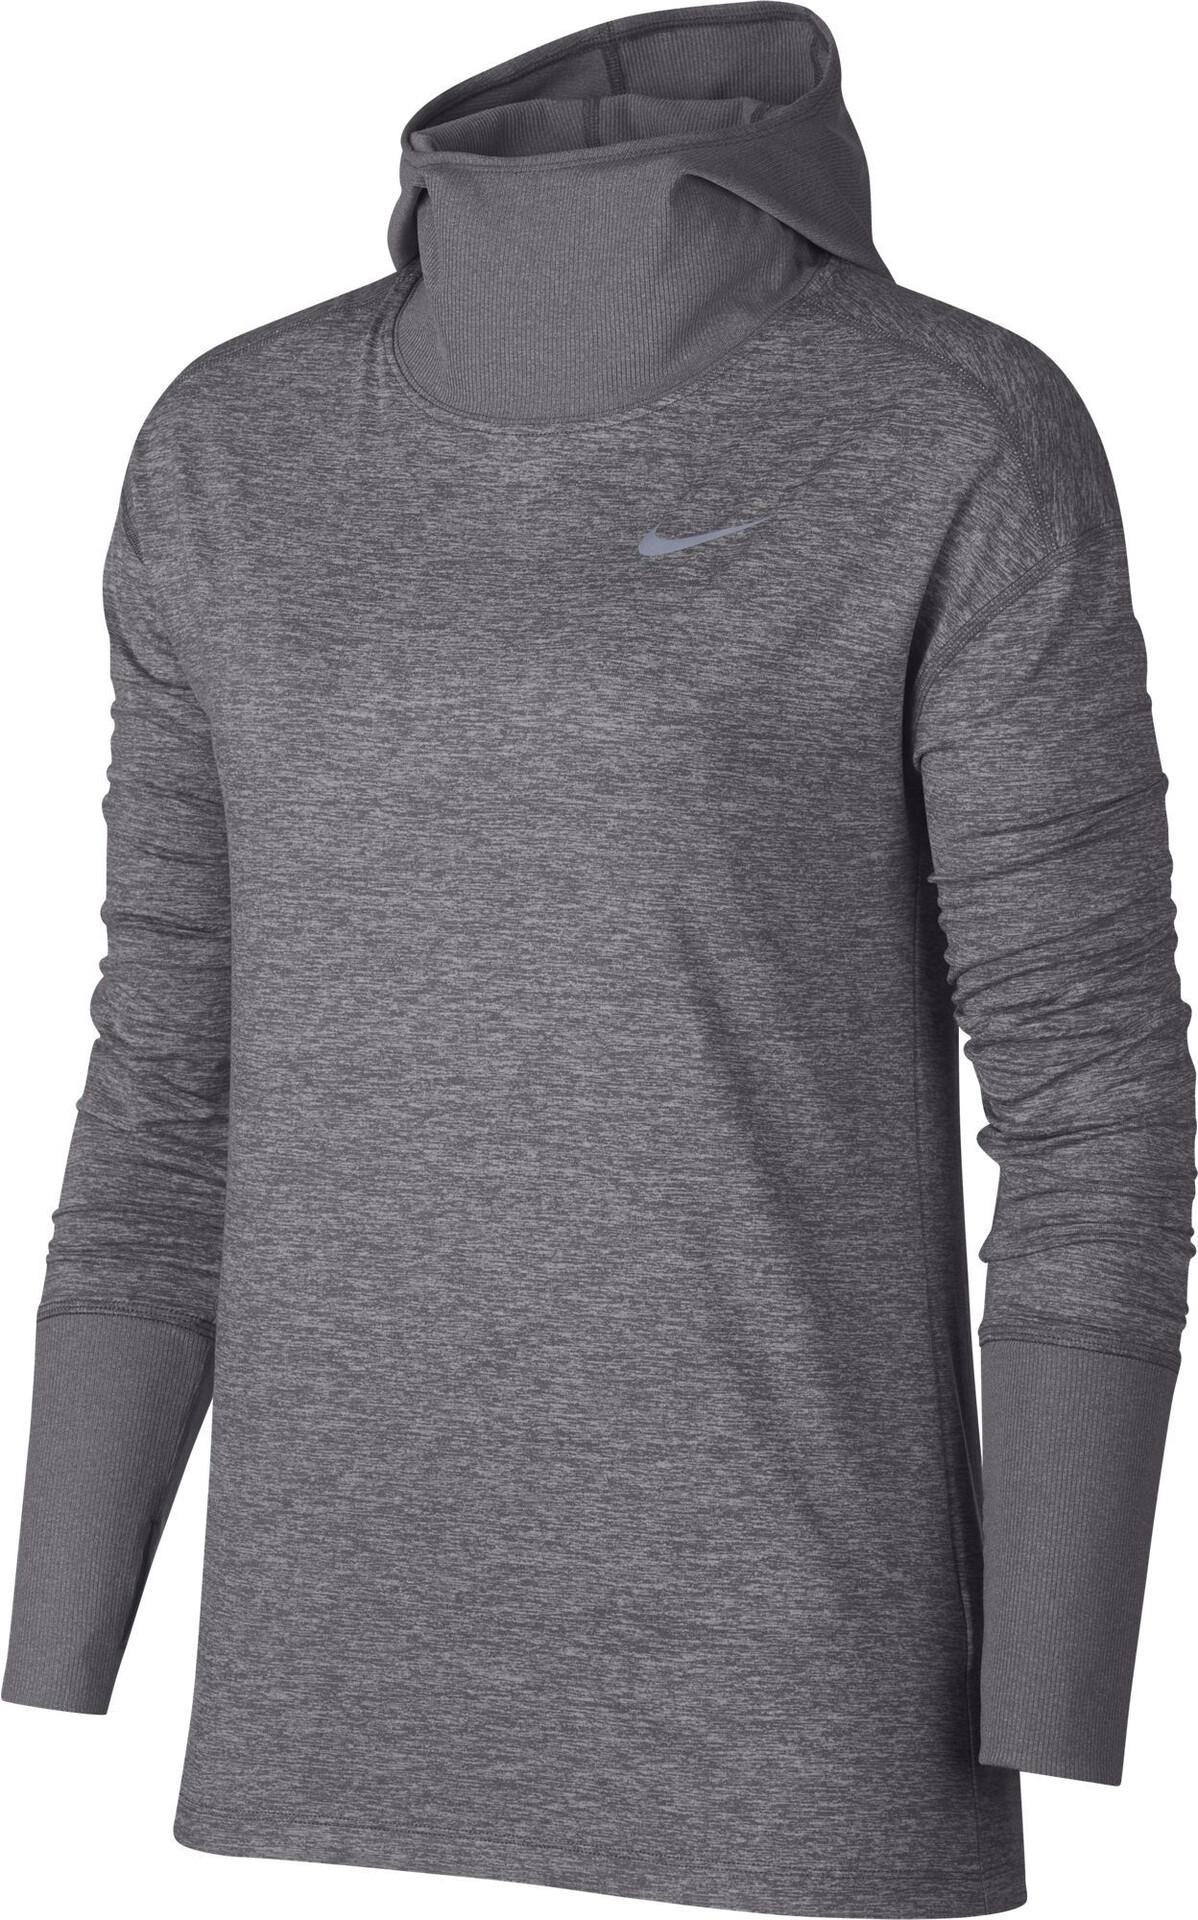 Longues Gris Shirt Femme Element Running Manches Nike T 16WRFqwU